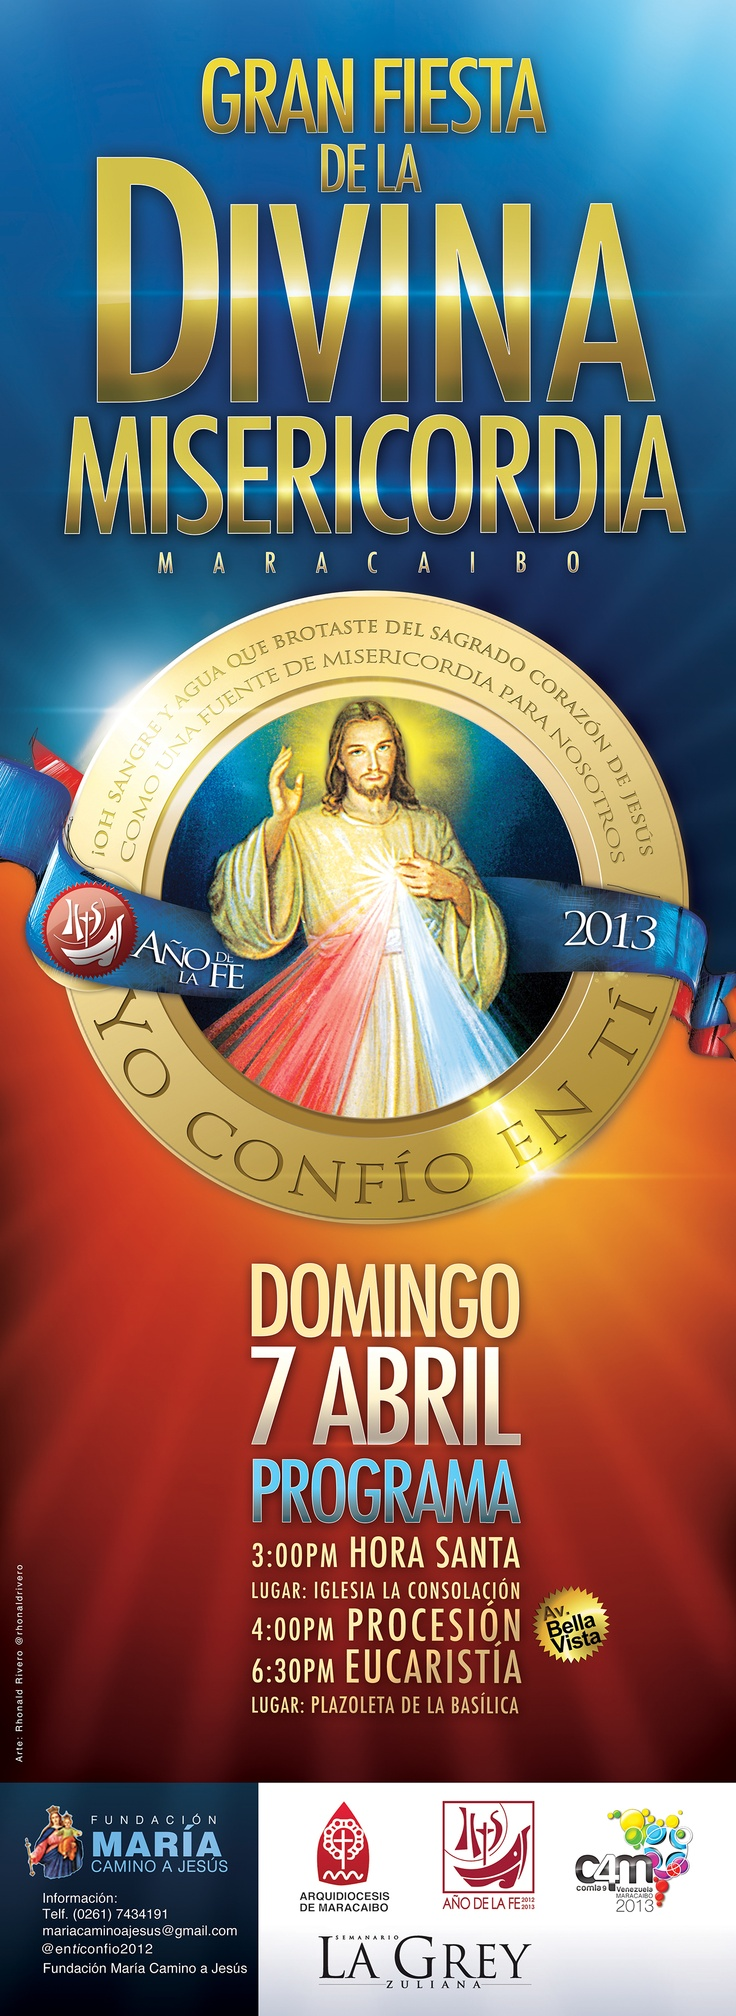 Gran Fiesta de la Divina Misericordia 2013 #Maracaibo